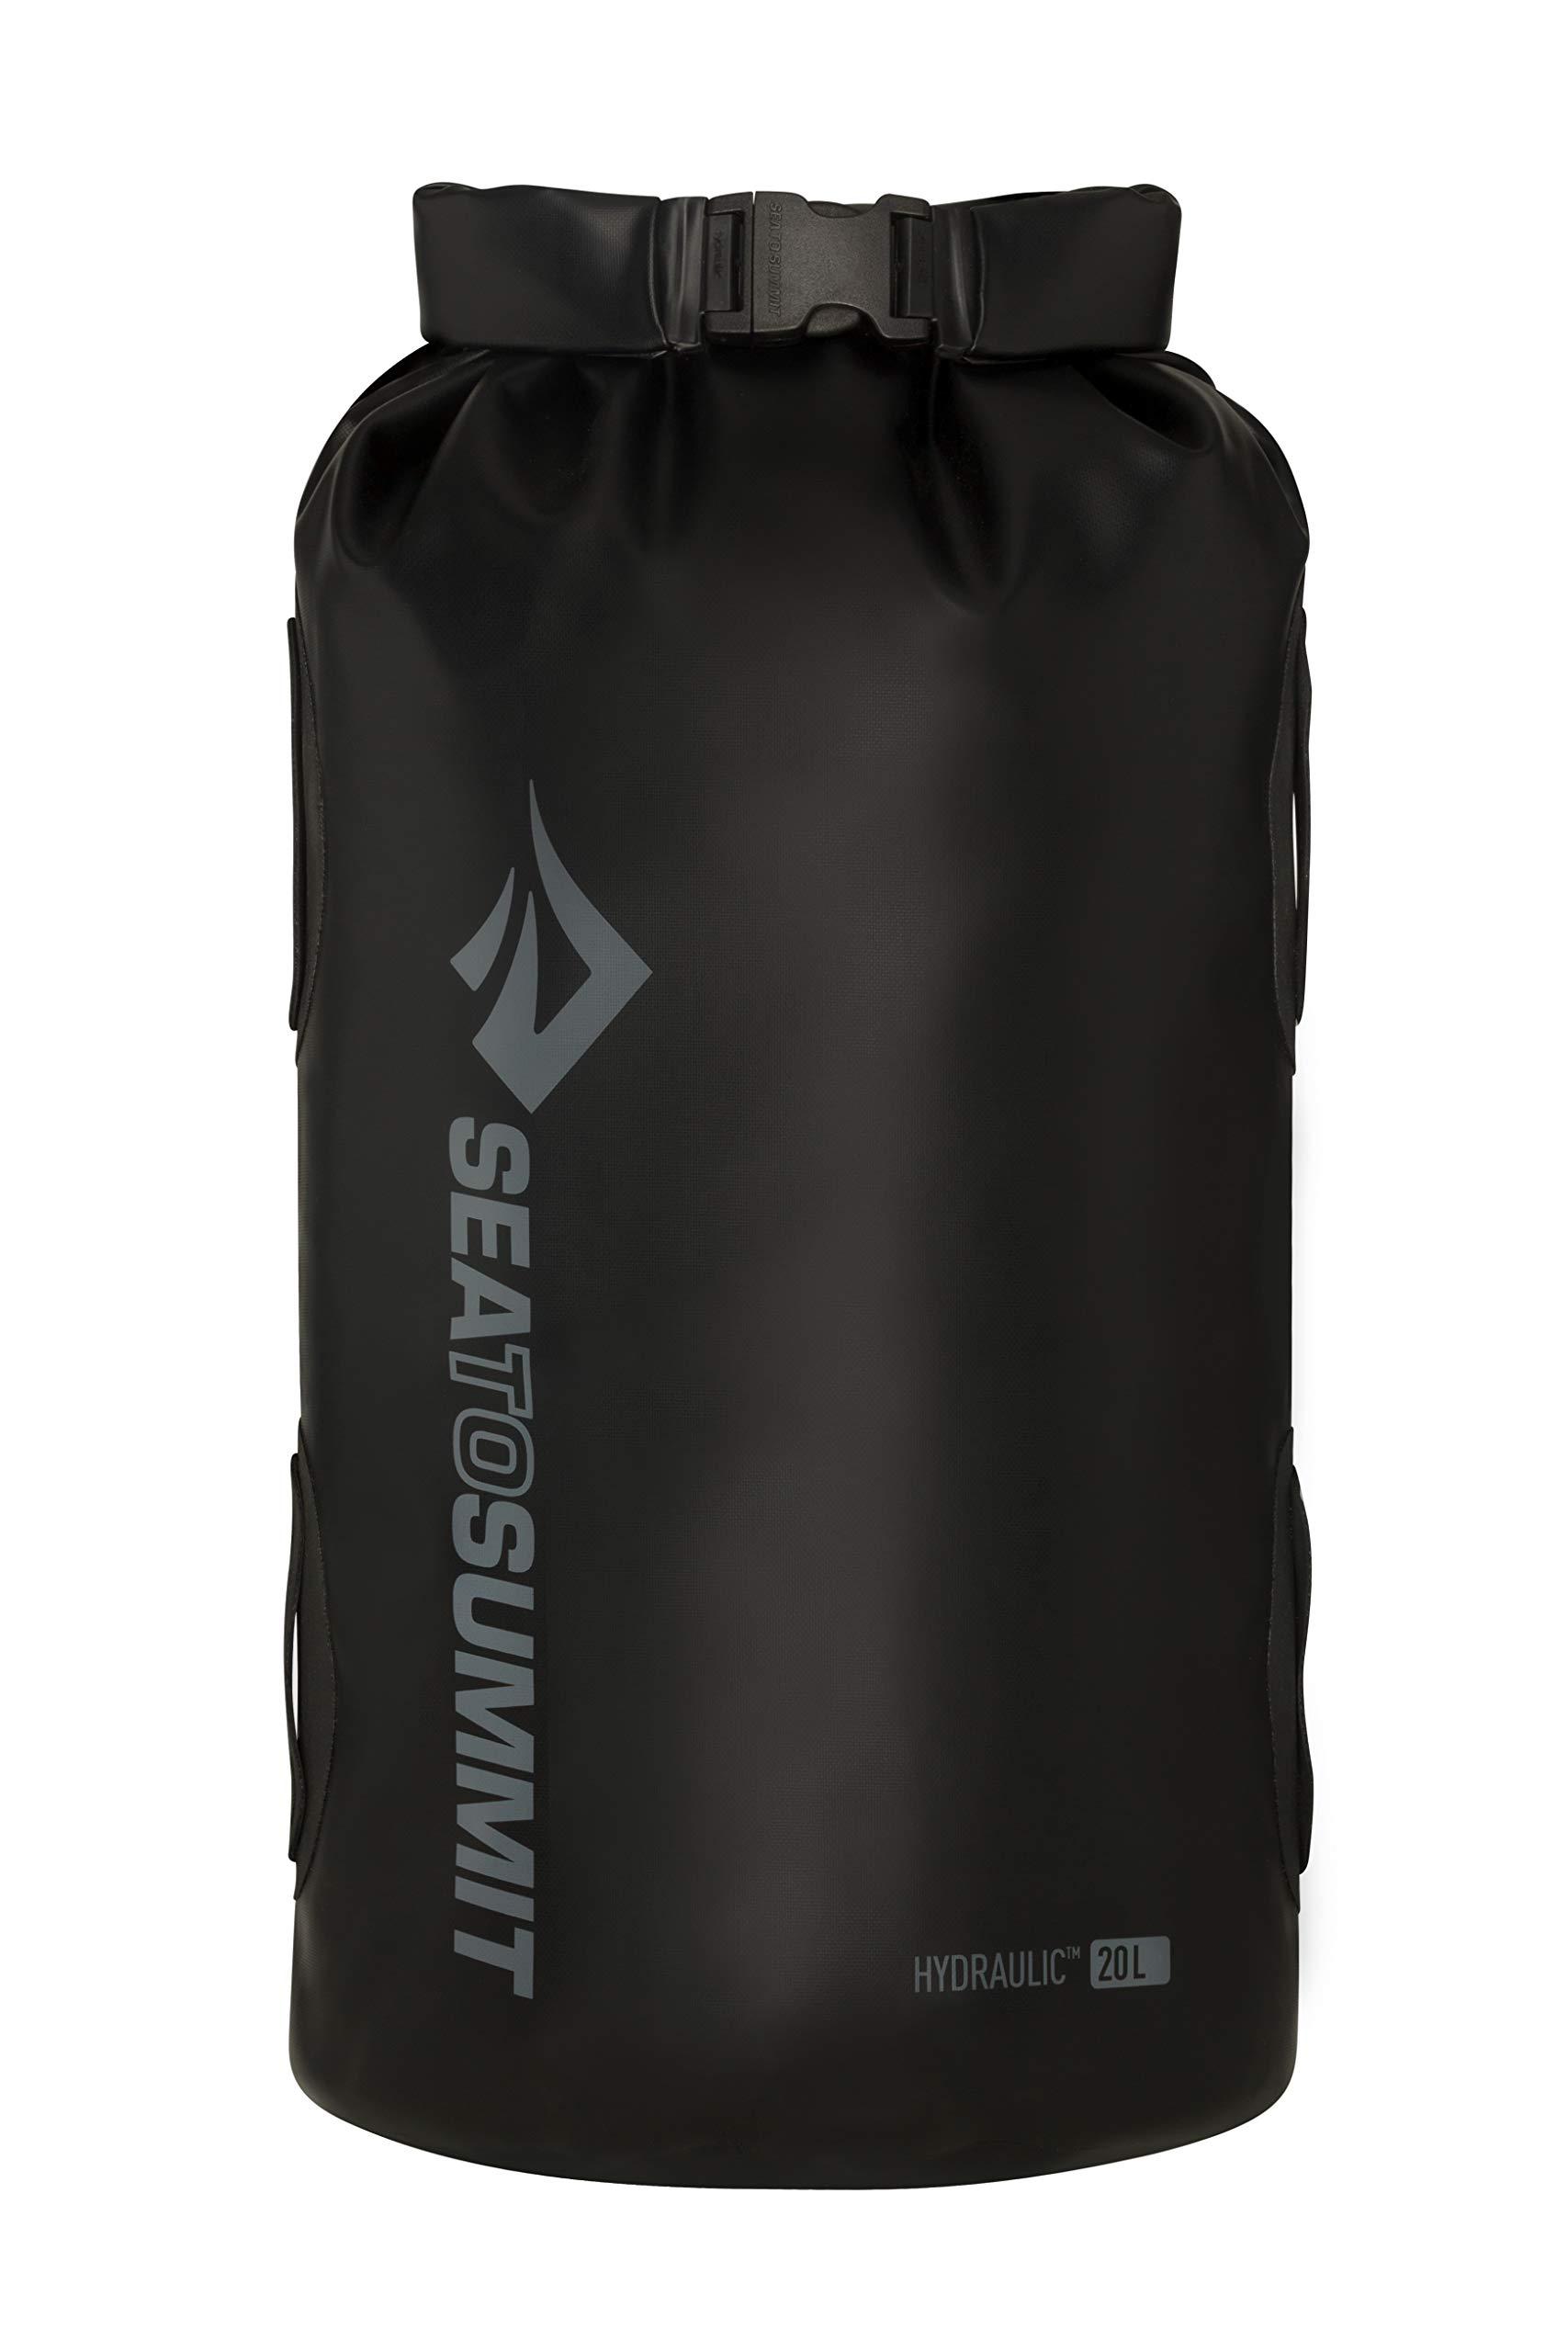 Sea to Summit Hydraulic Dry Bag, Black, 35 Liter by Sea to Summit